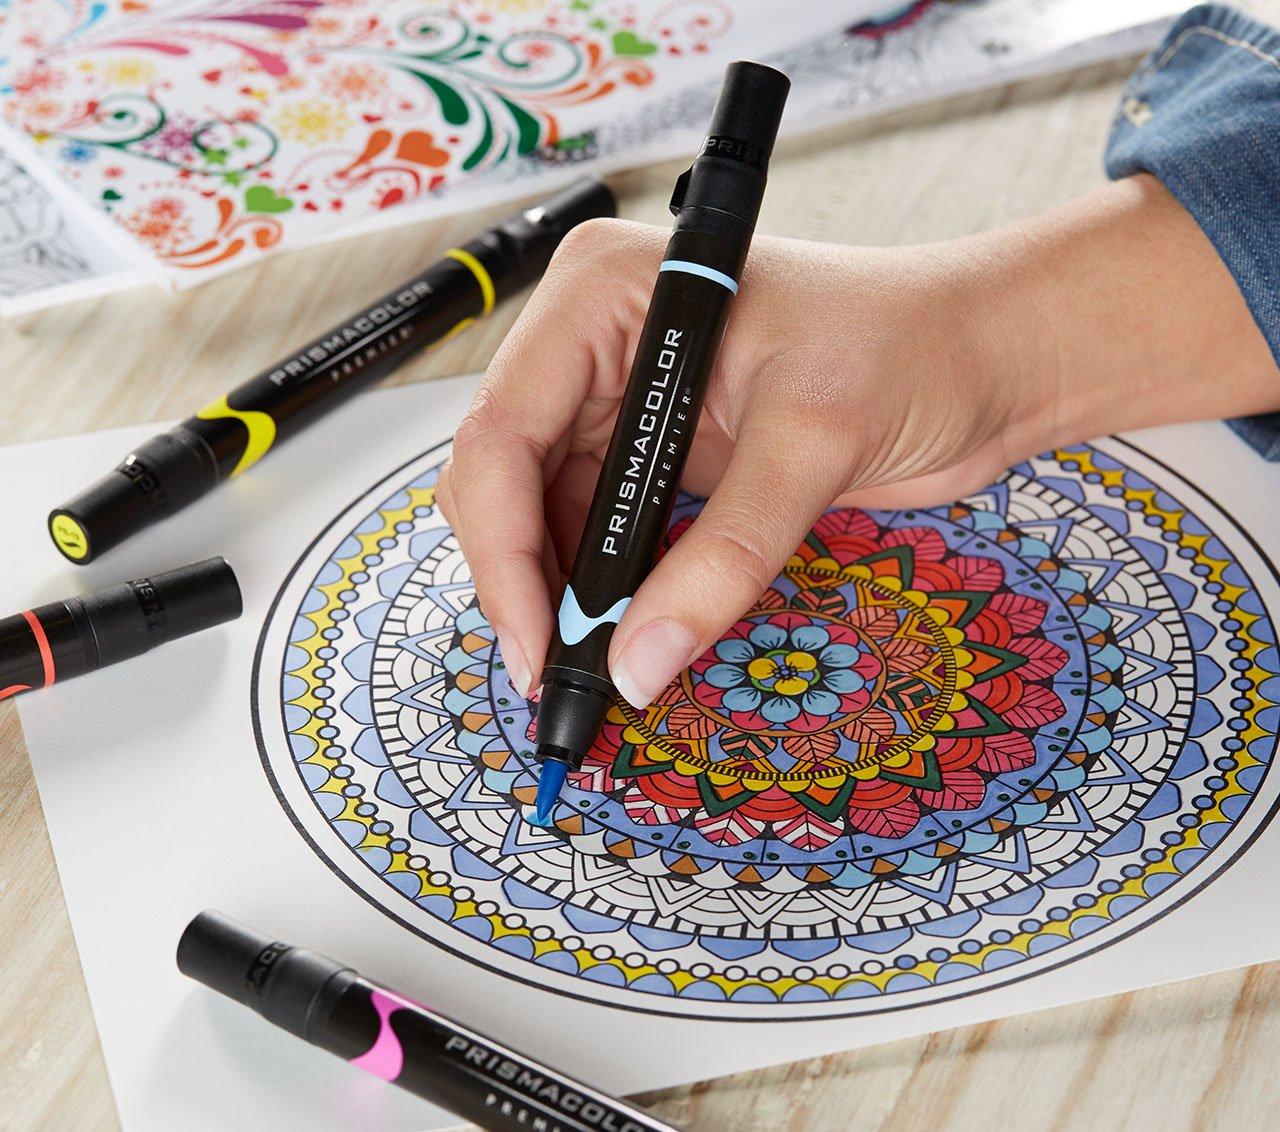 Introducing Prismacolor Premier Coloring Kits | MacKendrew Arts